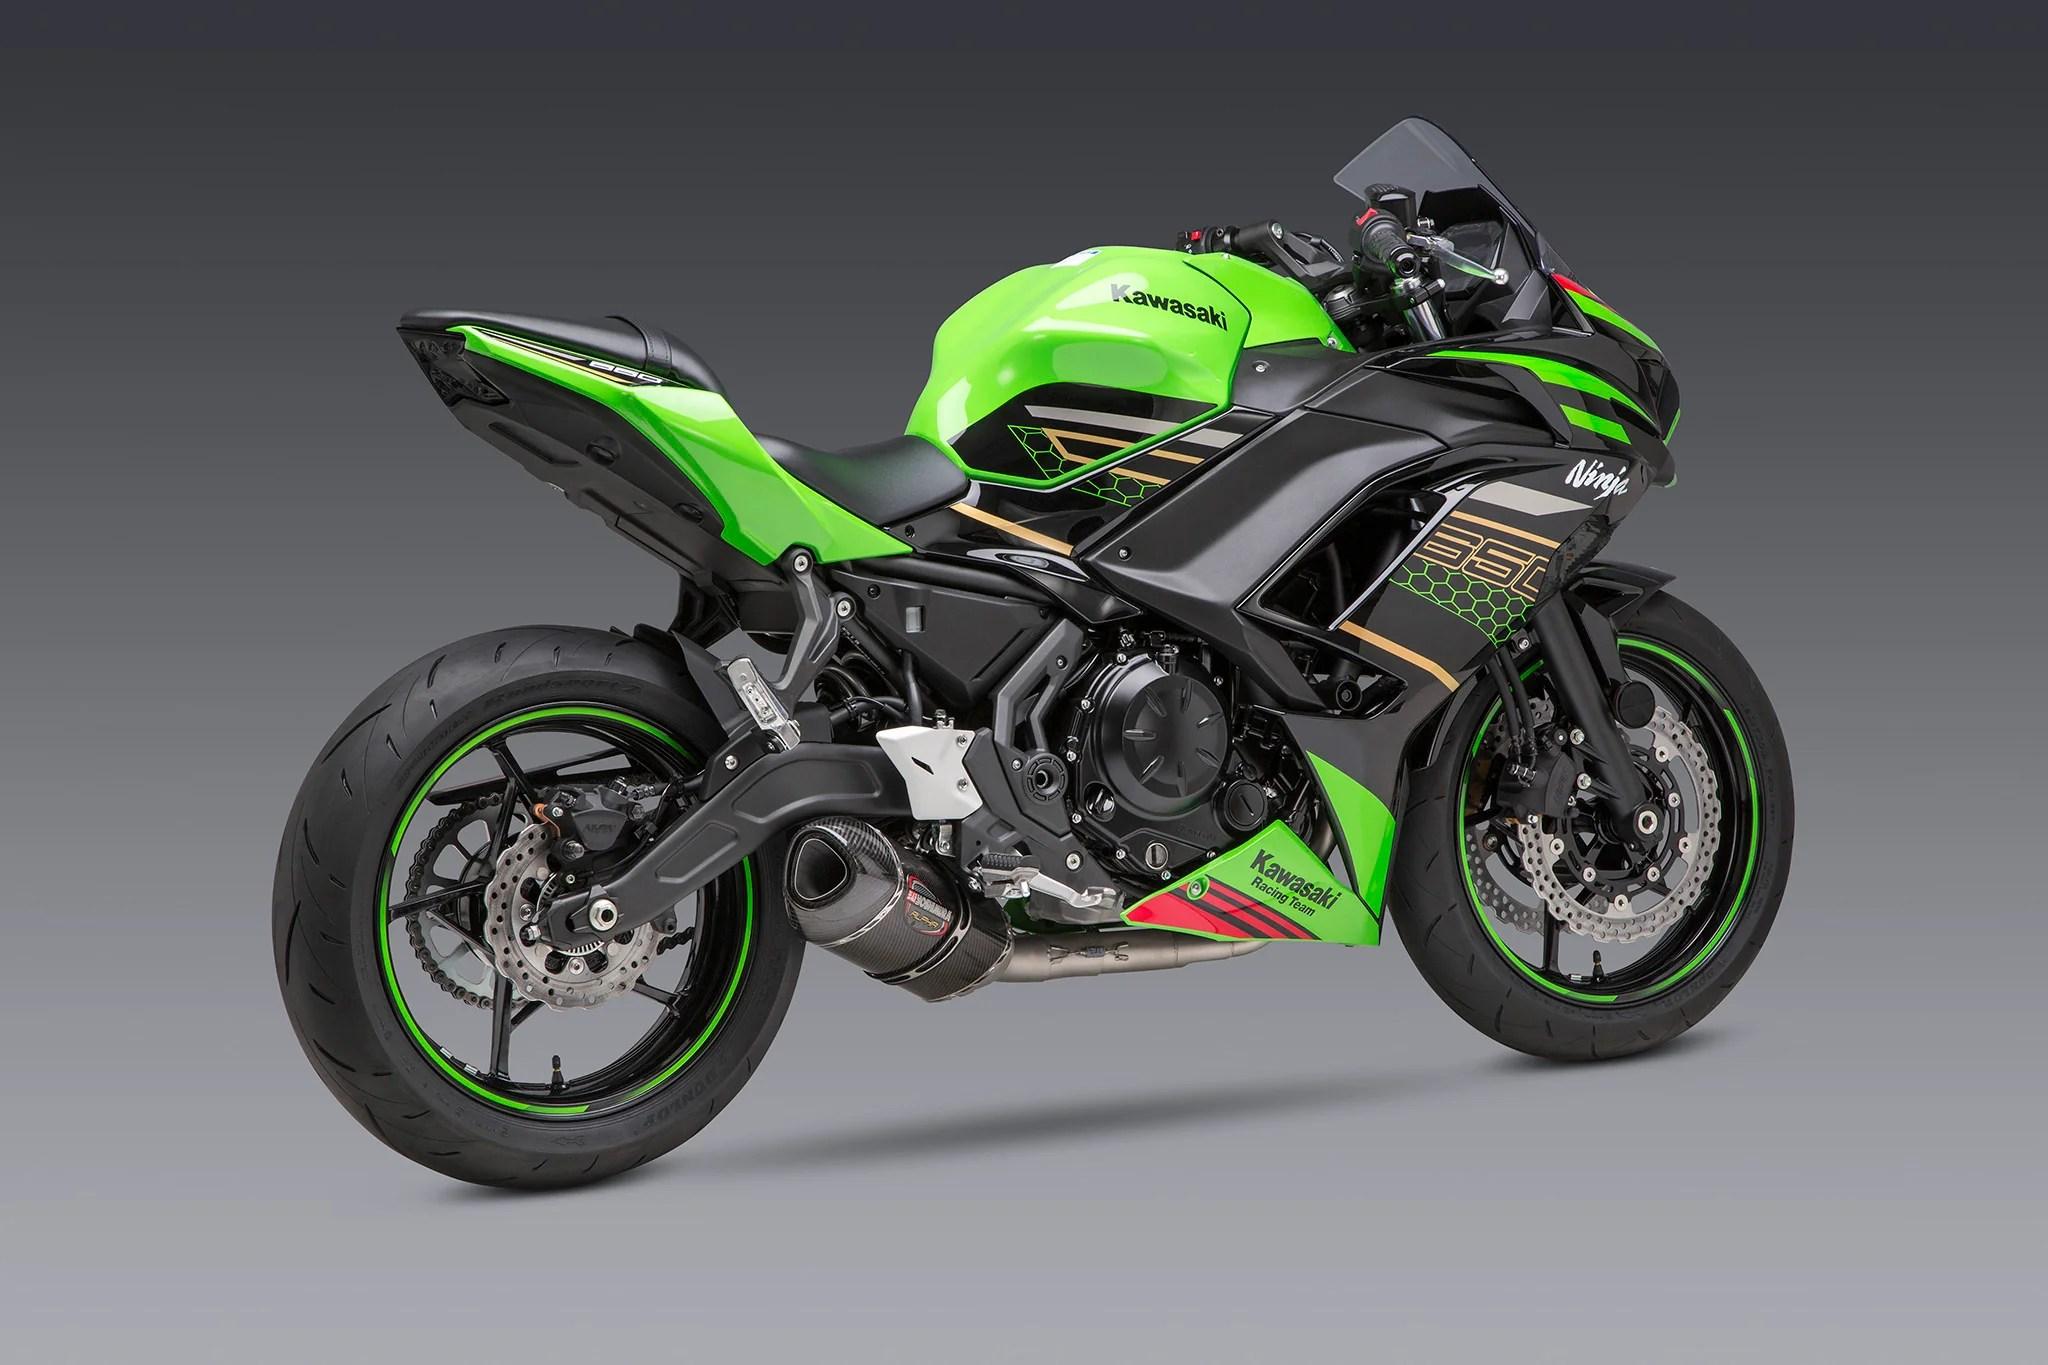 ninja z 650 17 21 race alpha stainless full exhaust w carbon fiber muffler